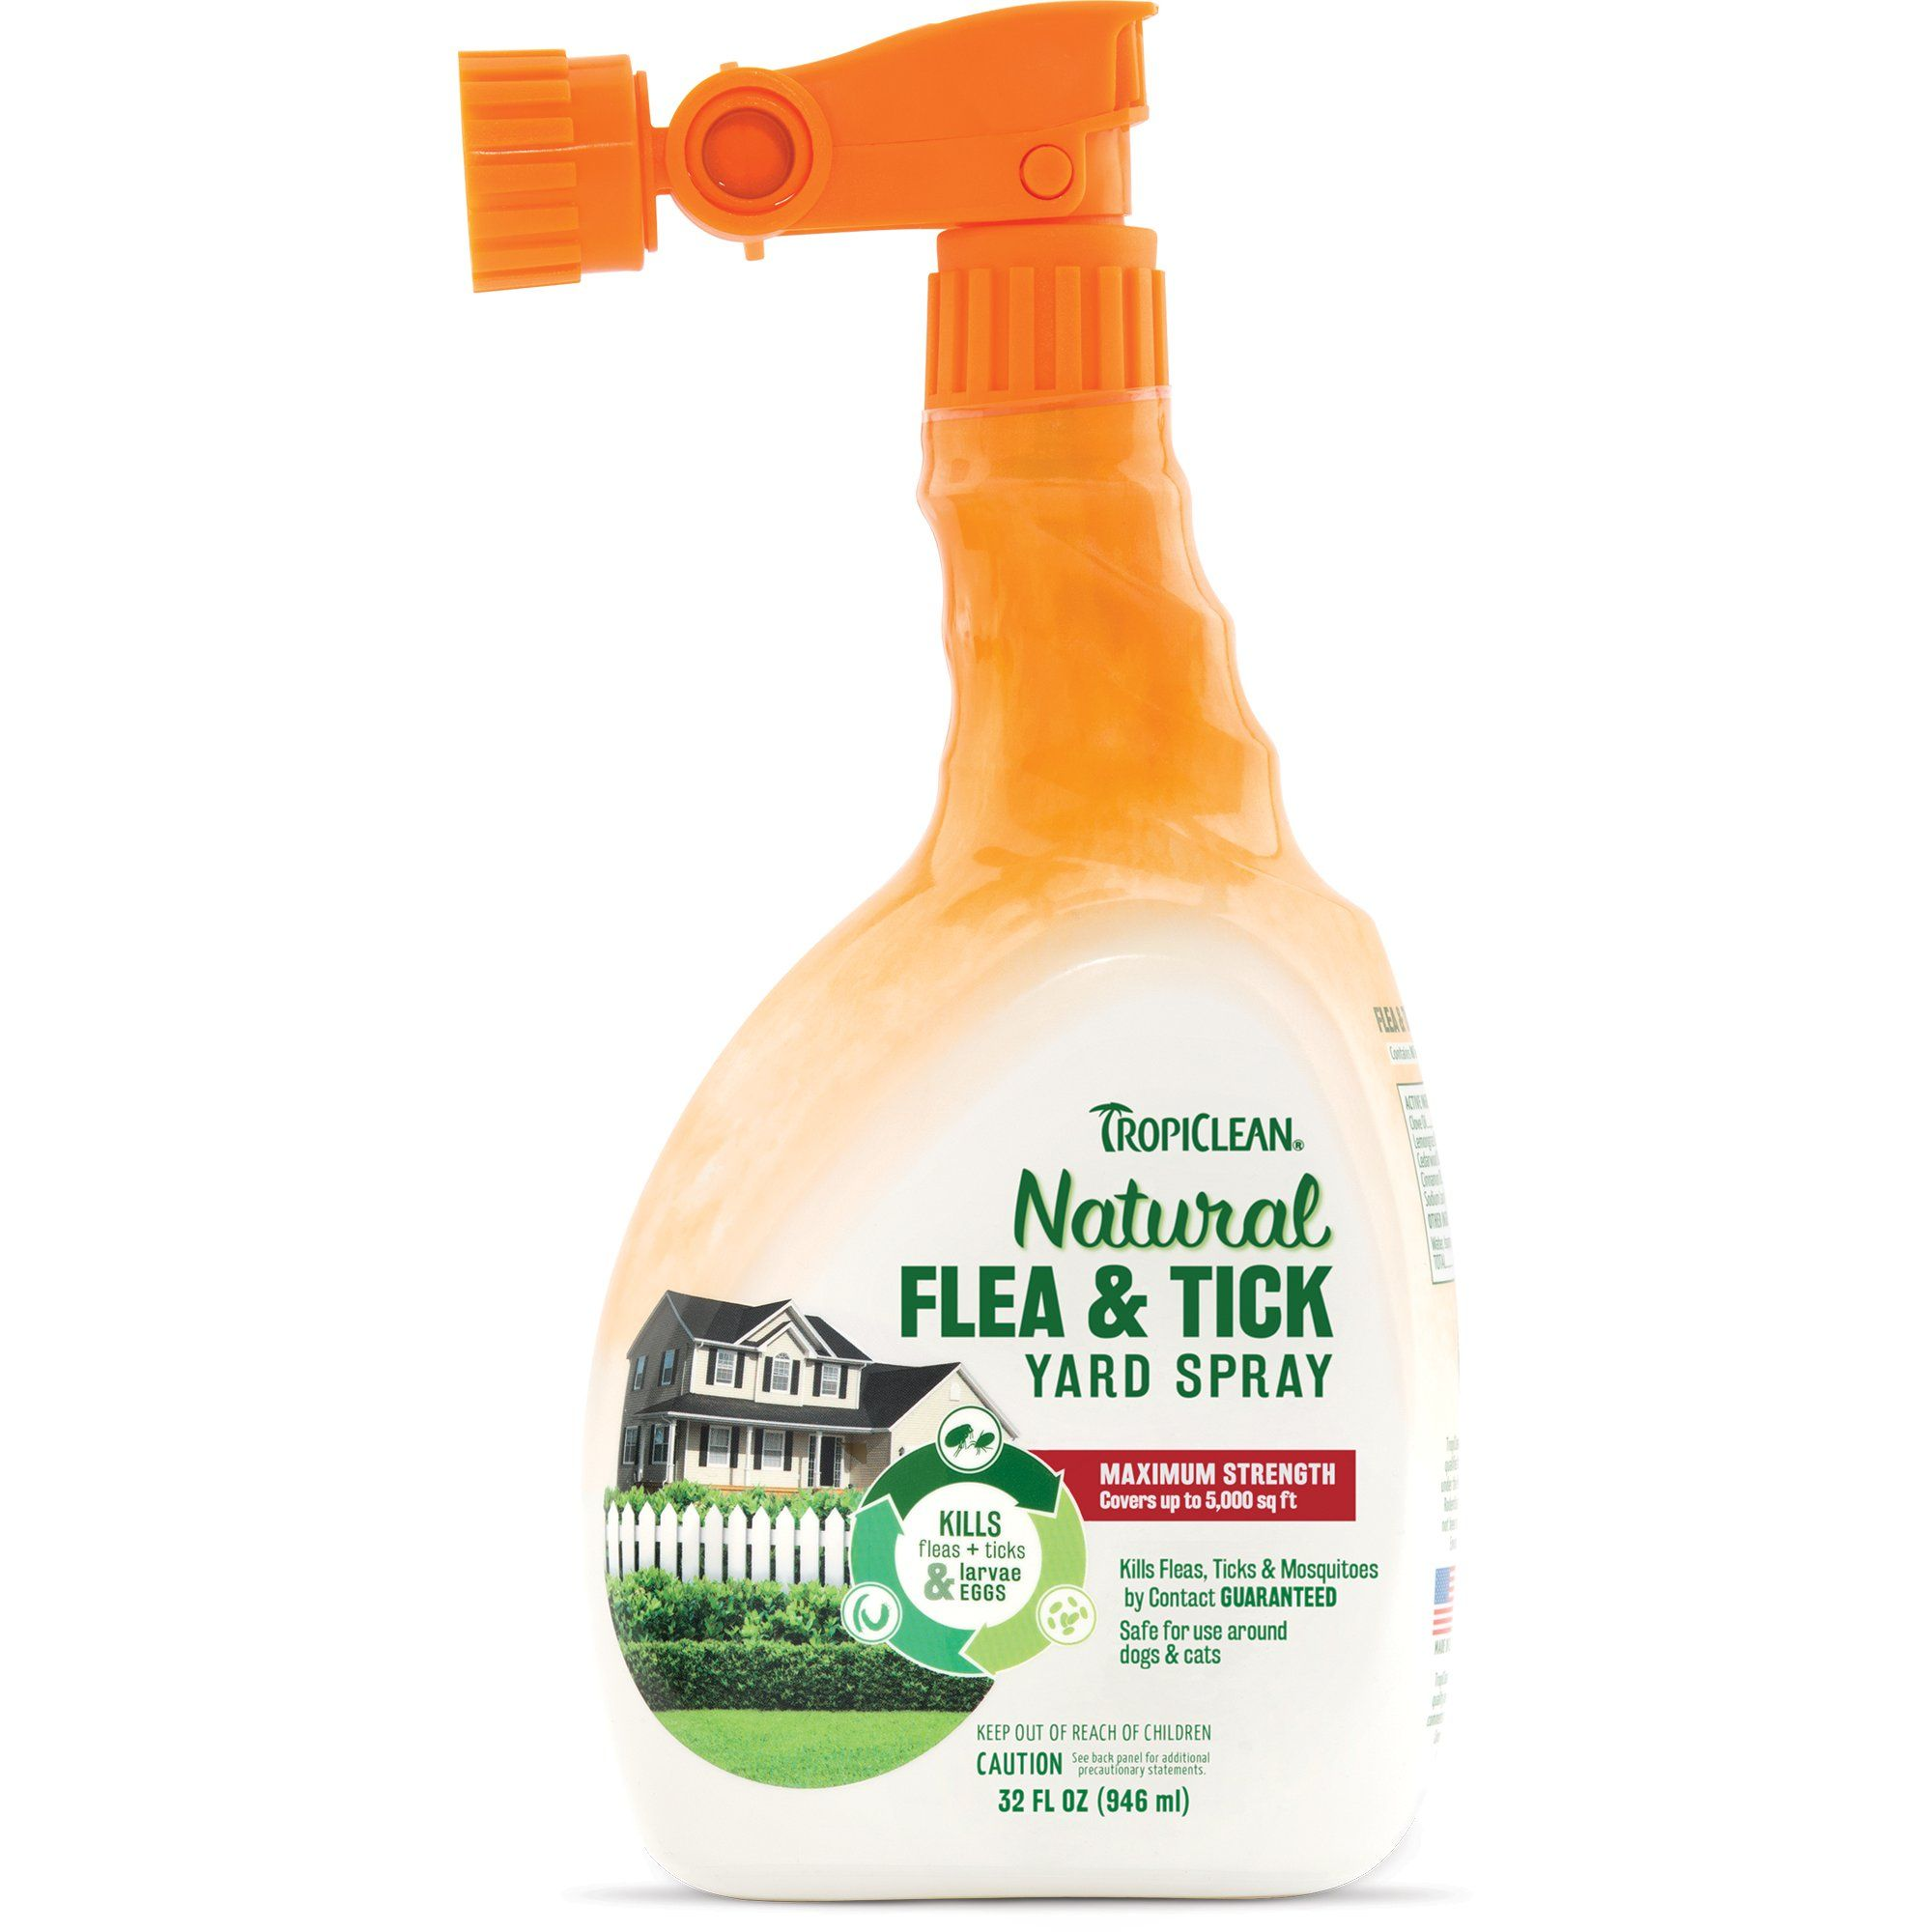 Tropiclean Natural Flea Tick Yard Spray 32 Fl Oz 32 Fz